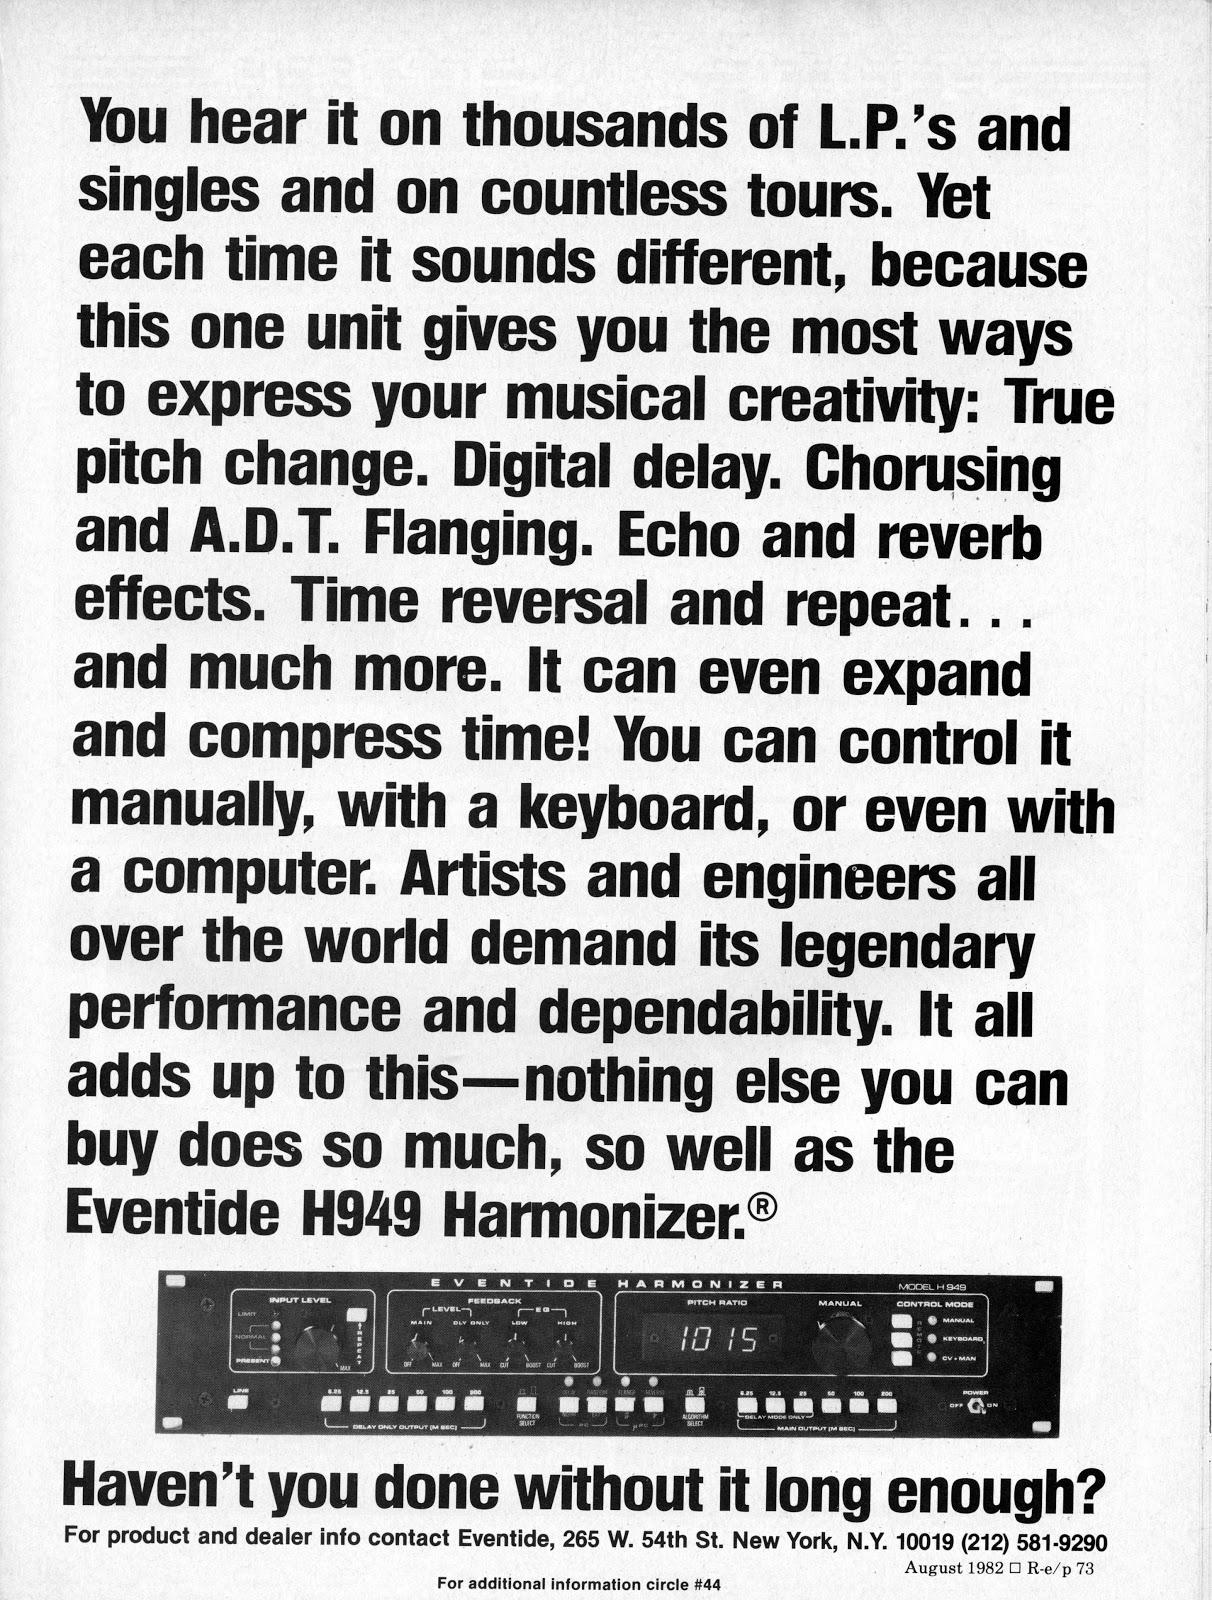 H949 Ad (1982)